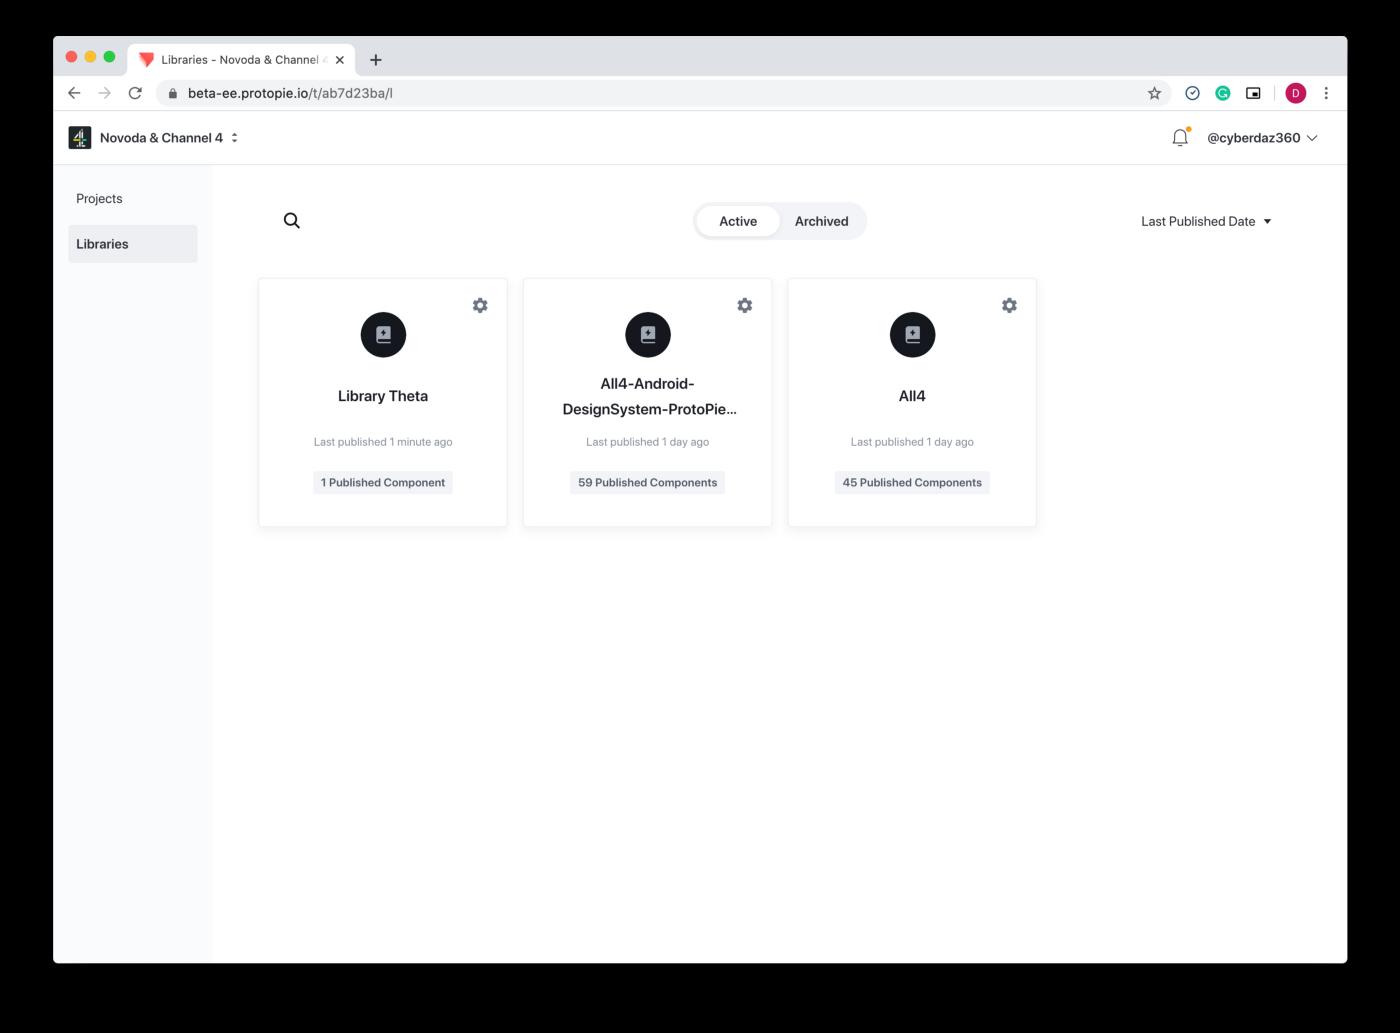 Libraries in ProtoPie Cloud